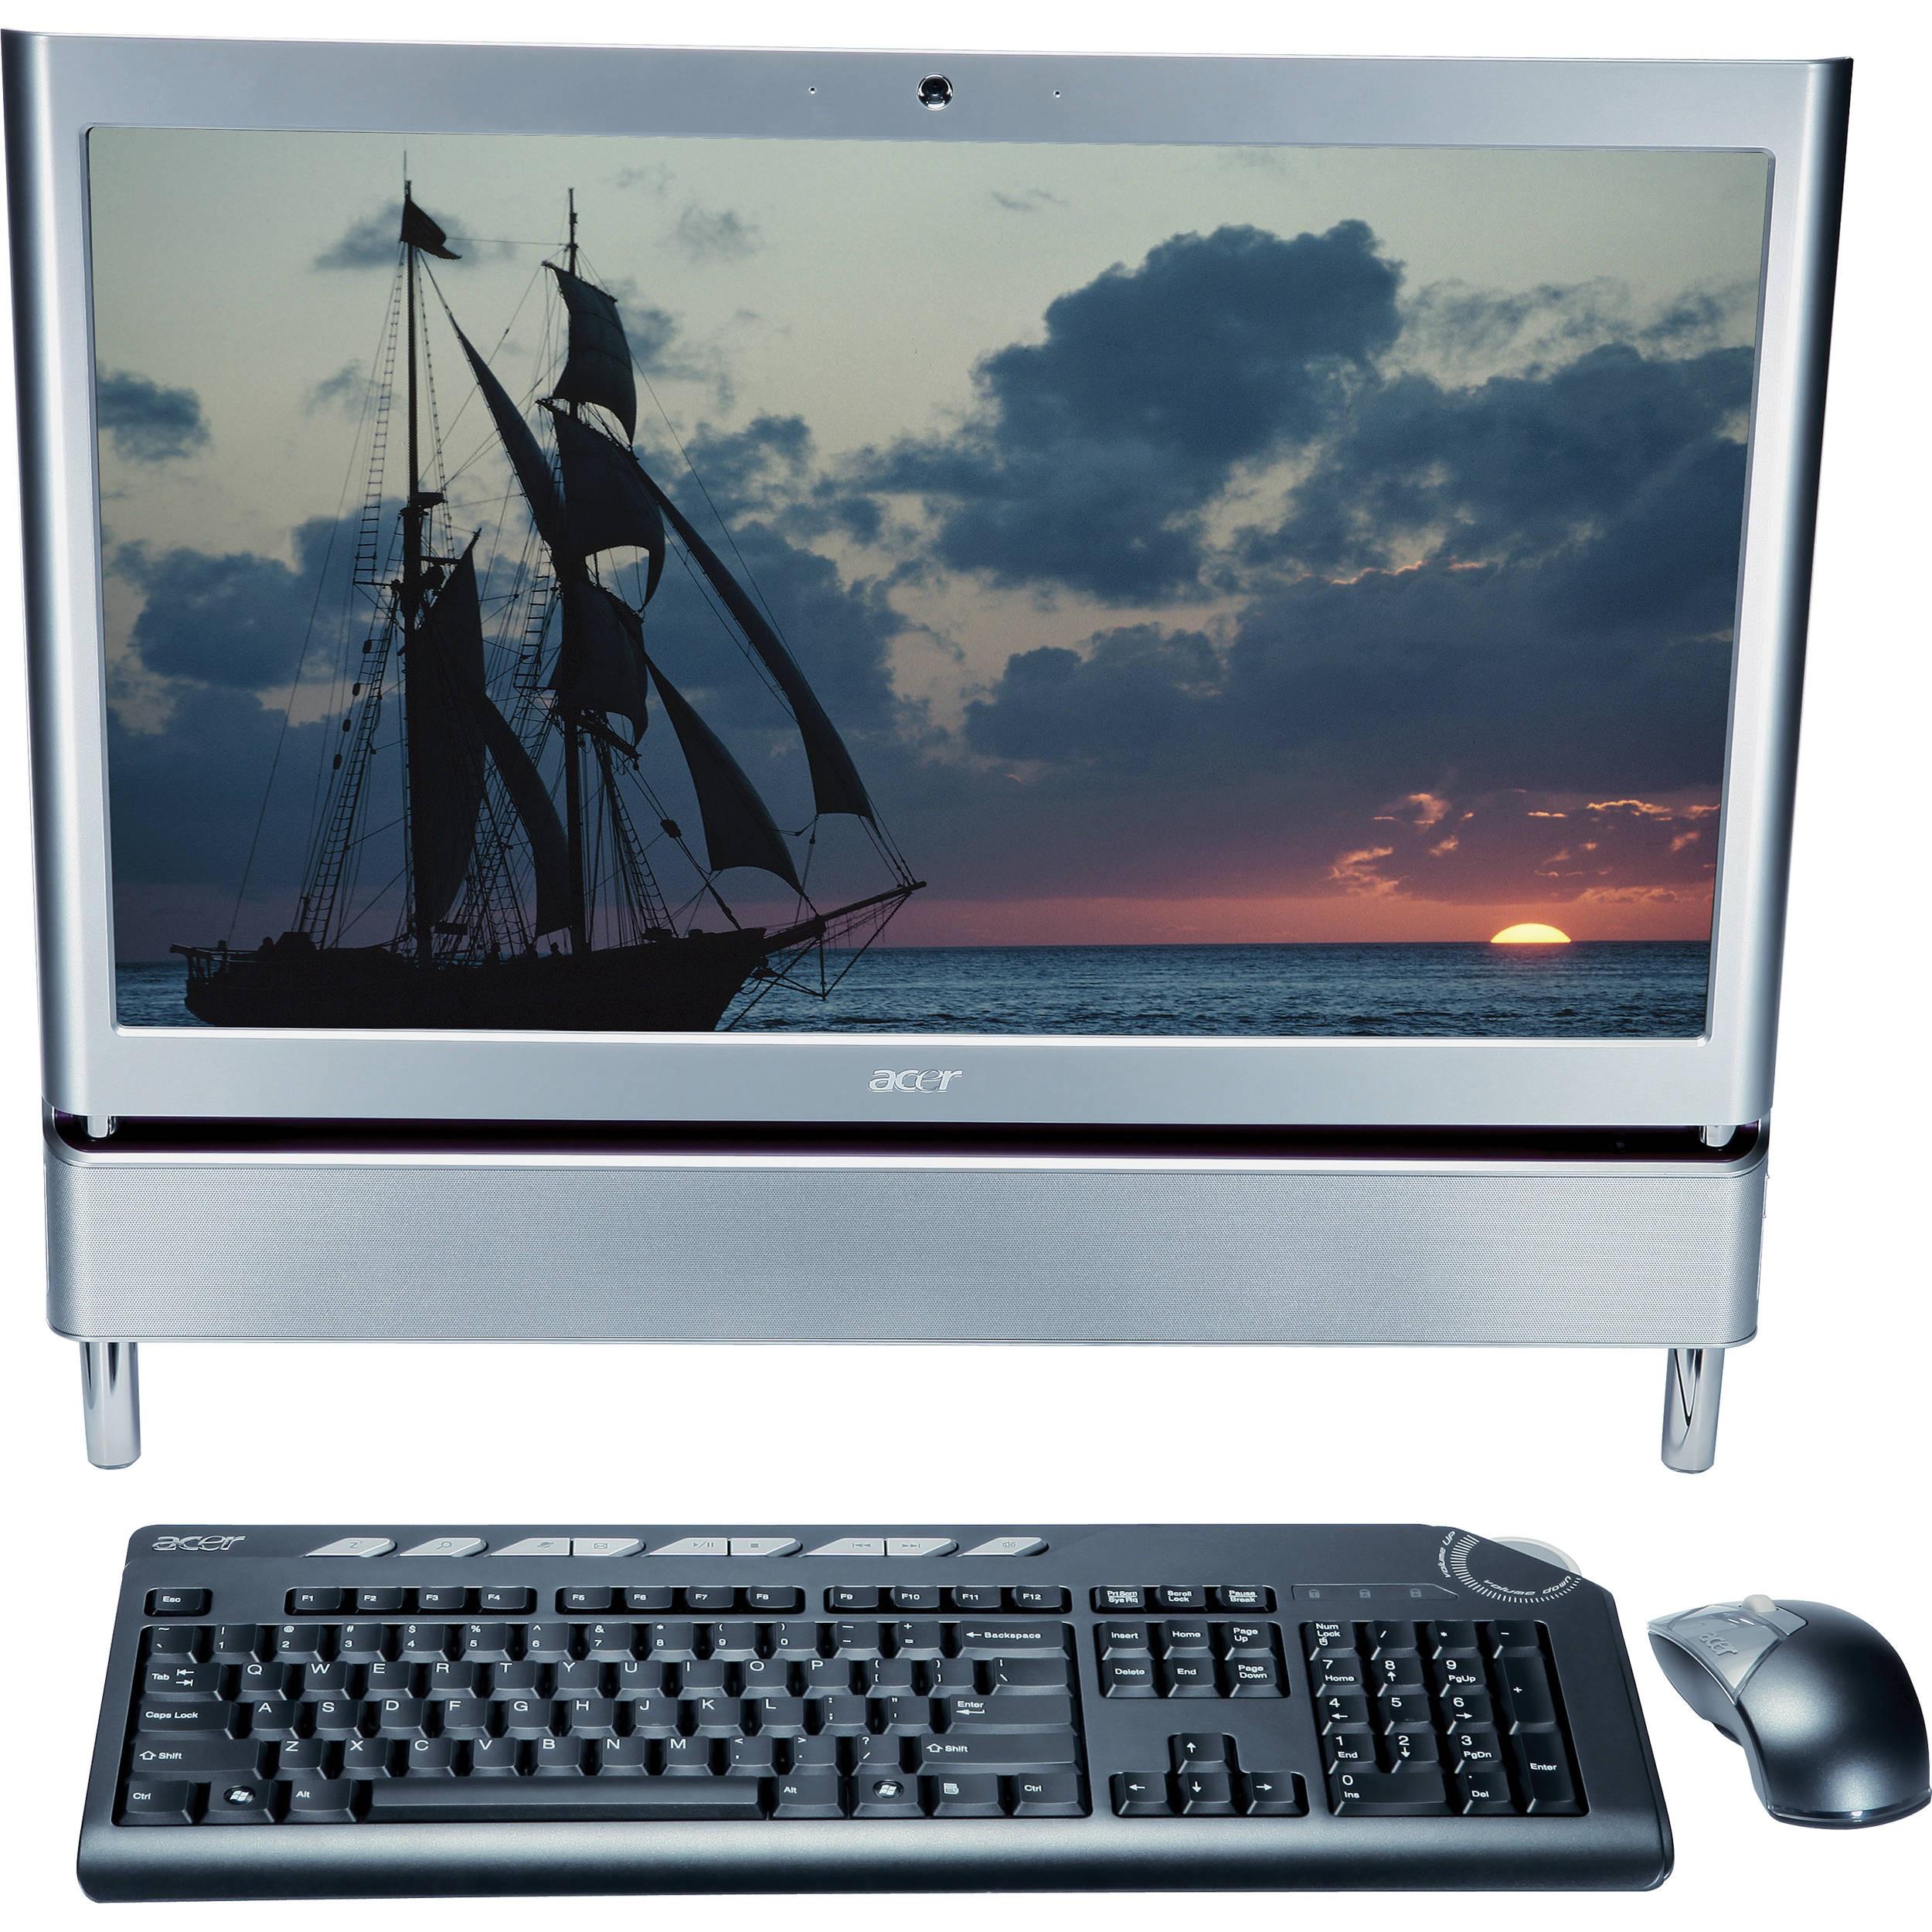 ACER PC Desktop ASPIRE Z5600 DESKTOP